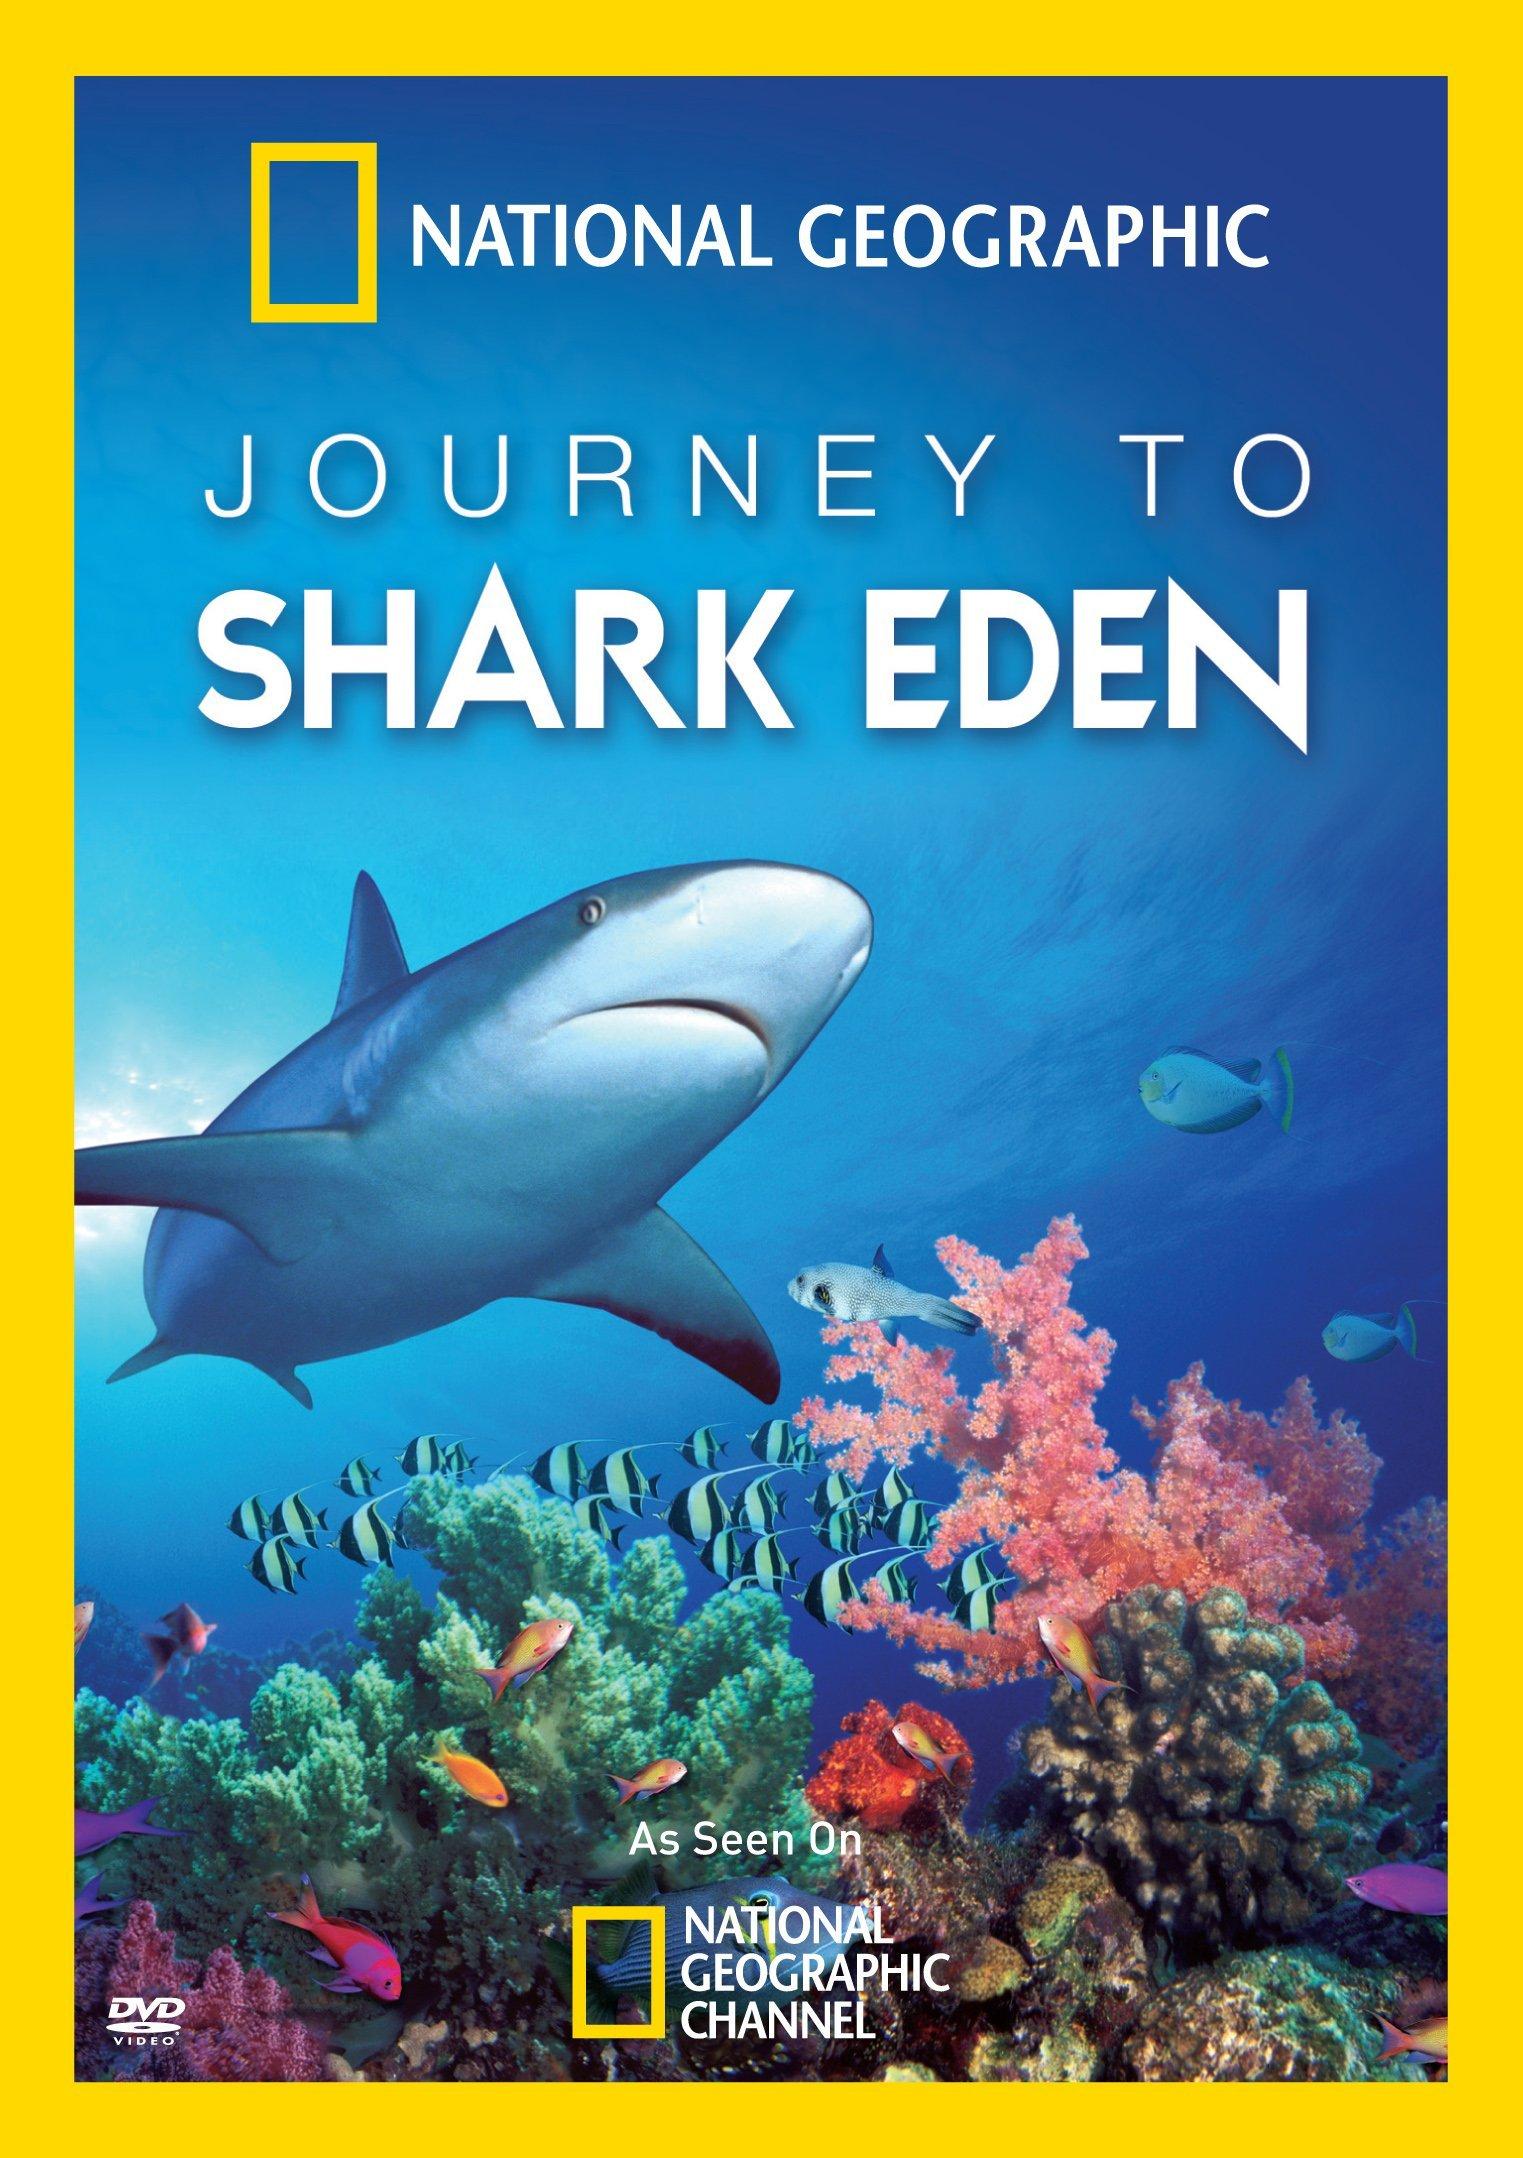 affiche poster journey paradis eden requins shark disney nat geo